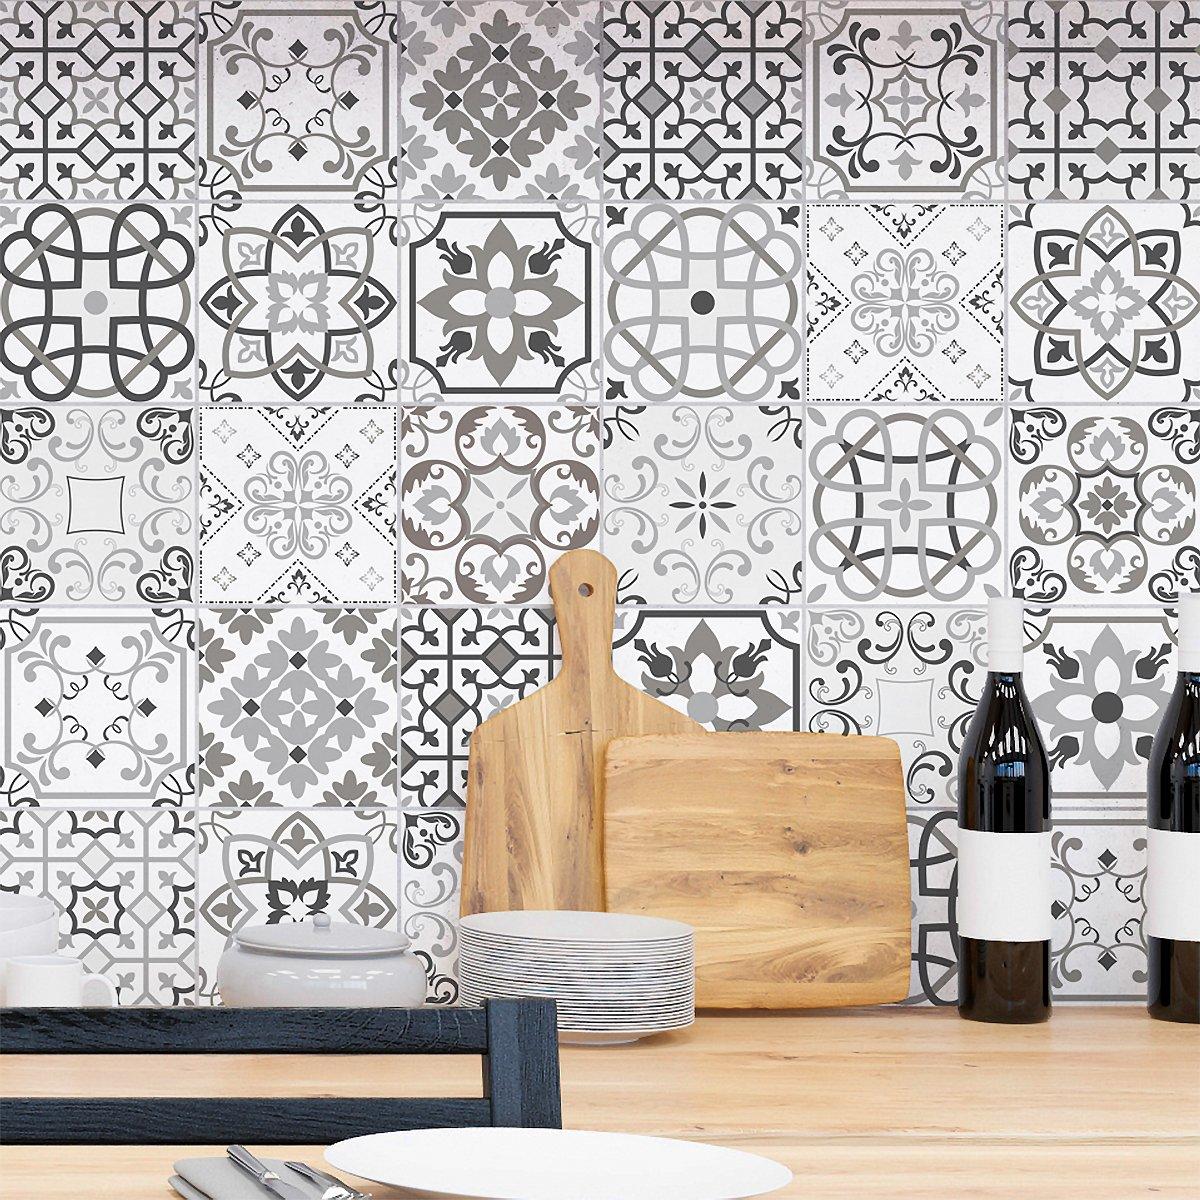 ambiance-live col-tiles-ros-a916_ 15x 15cm adesivi adesivi piastrelle, Multicolore, 15x 15cm, set di 30pezzi col-tiles-ROS-A916_15x15cm